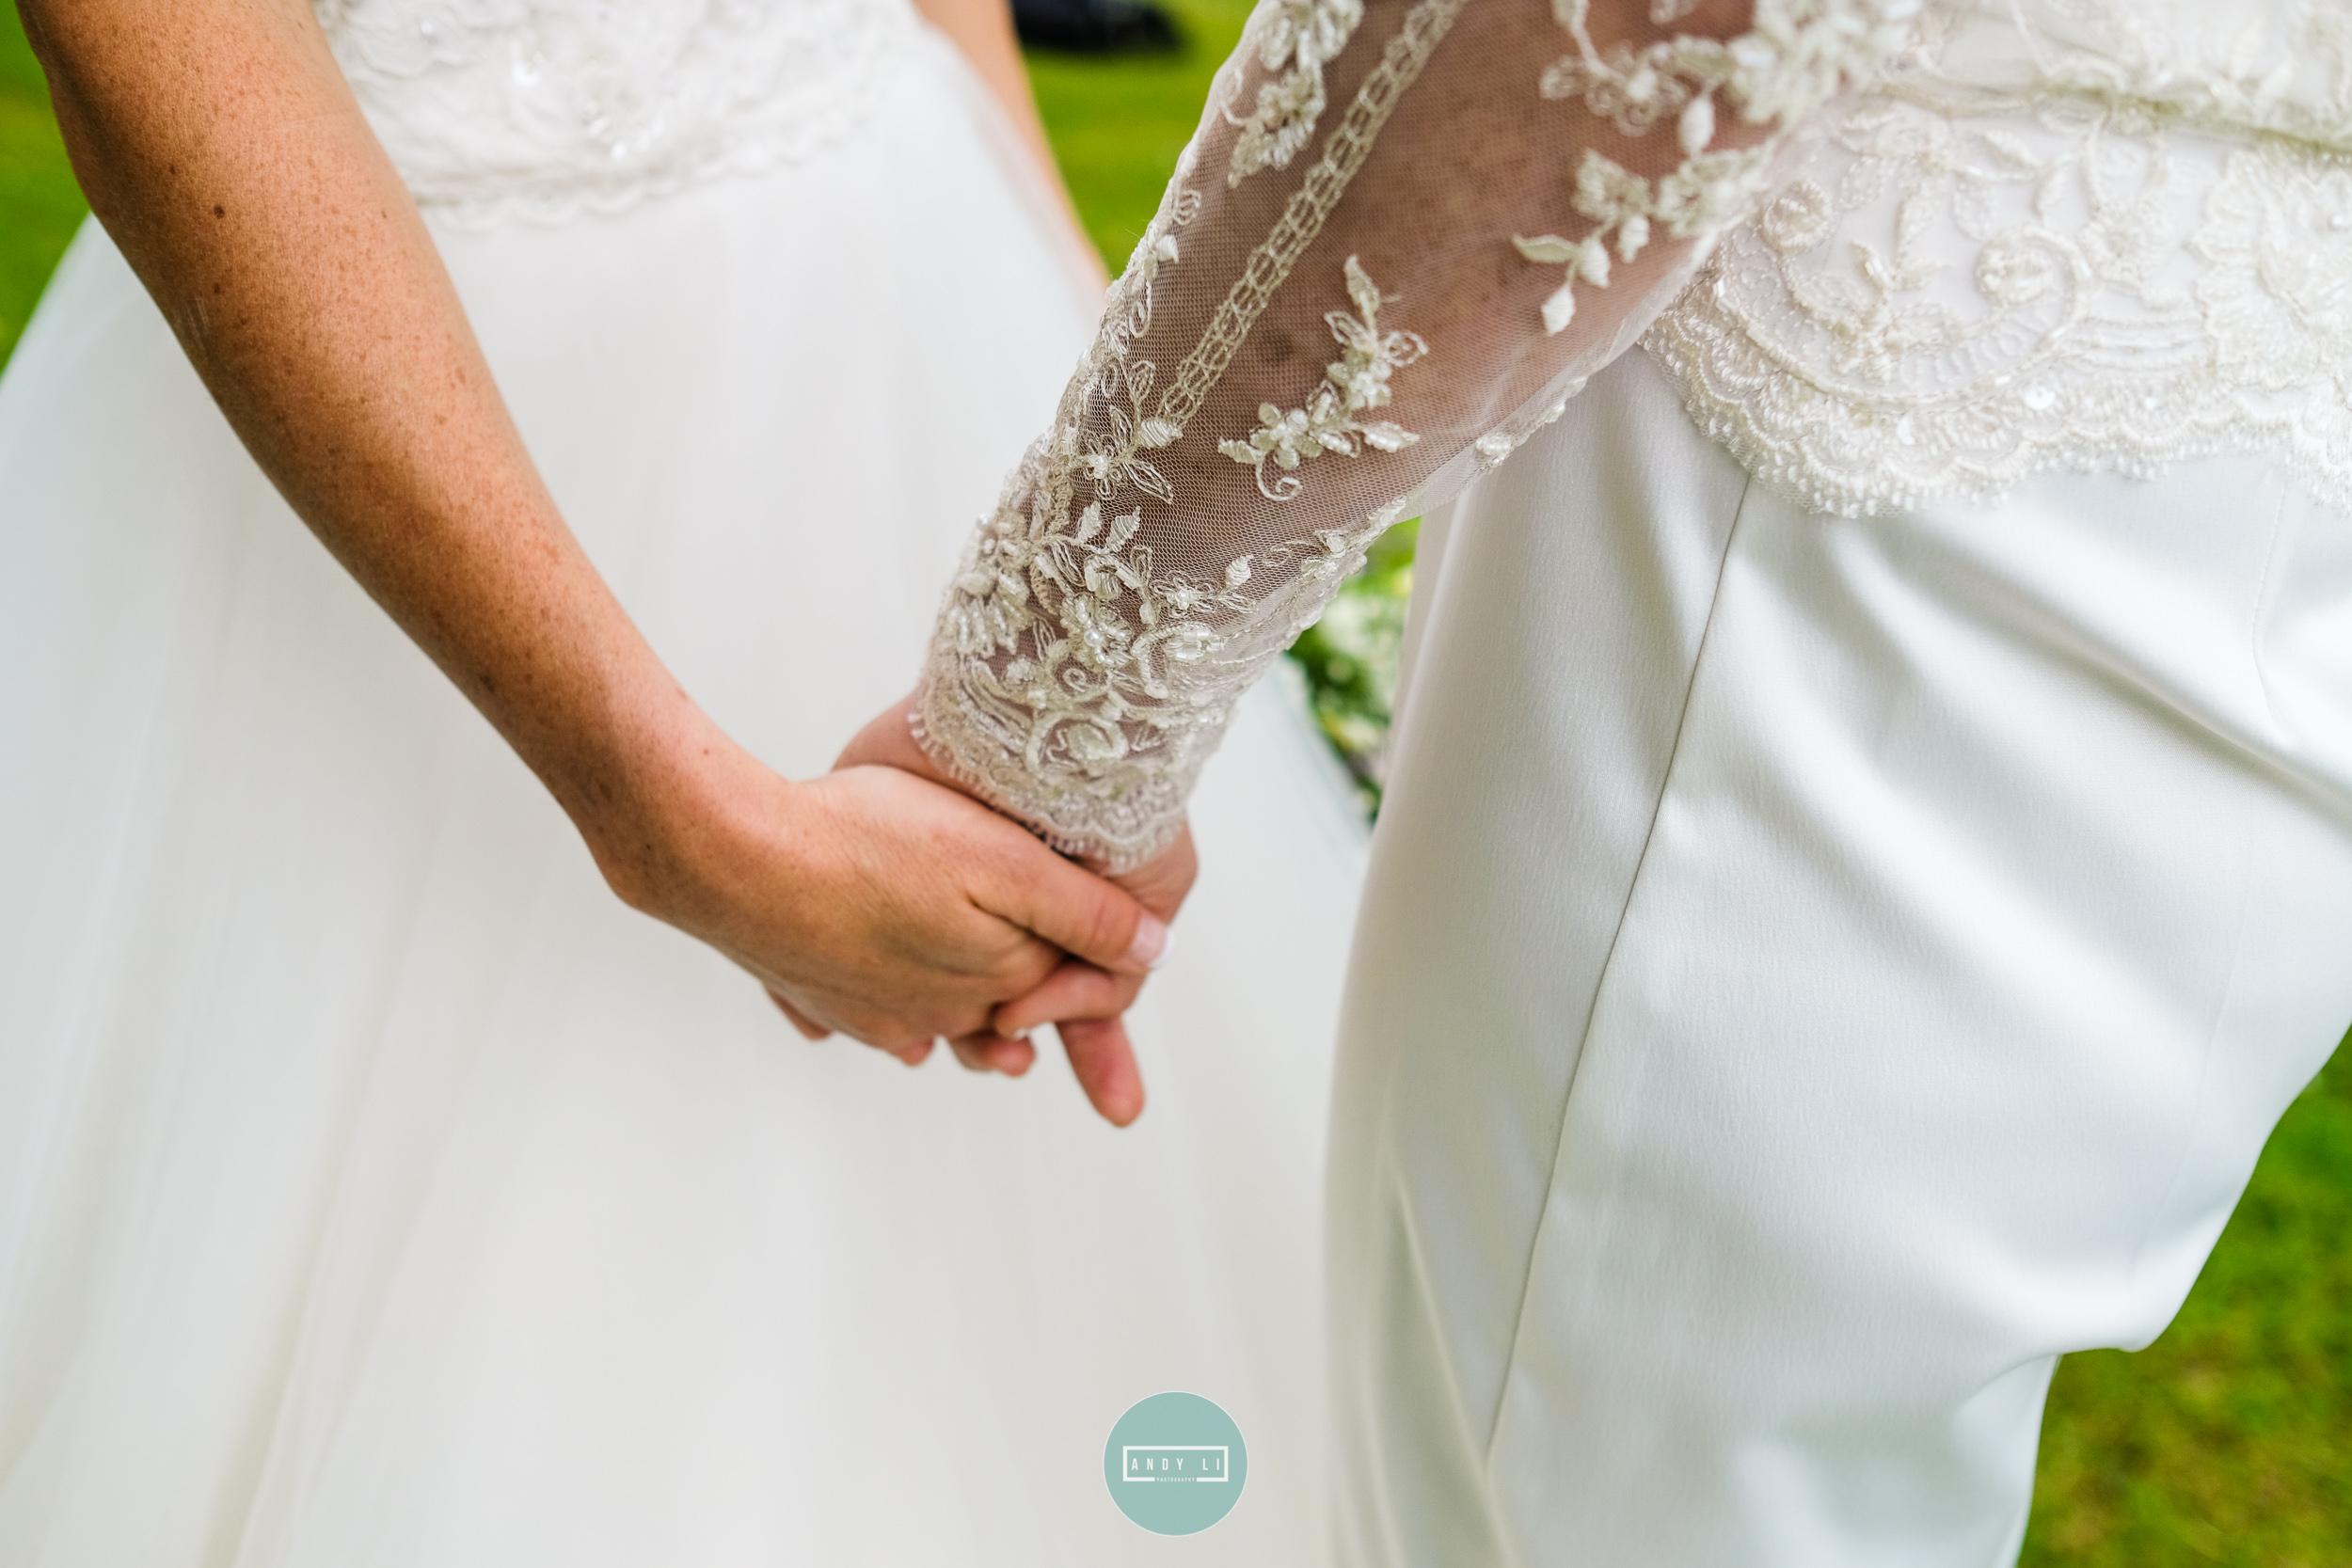 Manley Mere Cheshire Wedding Photographer-007-AXT20618.jpg